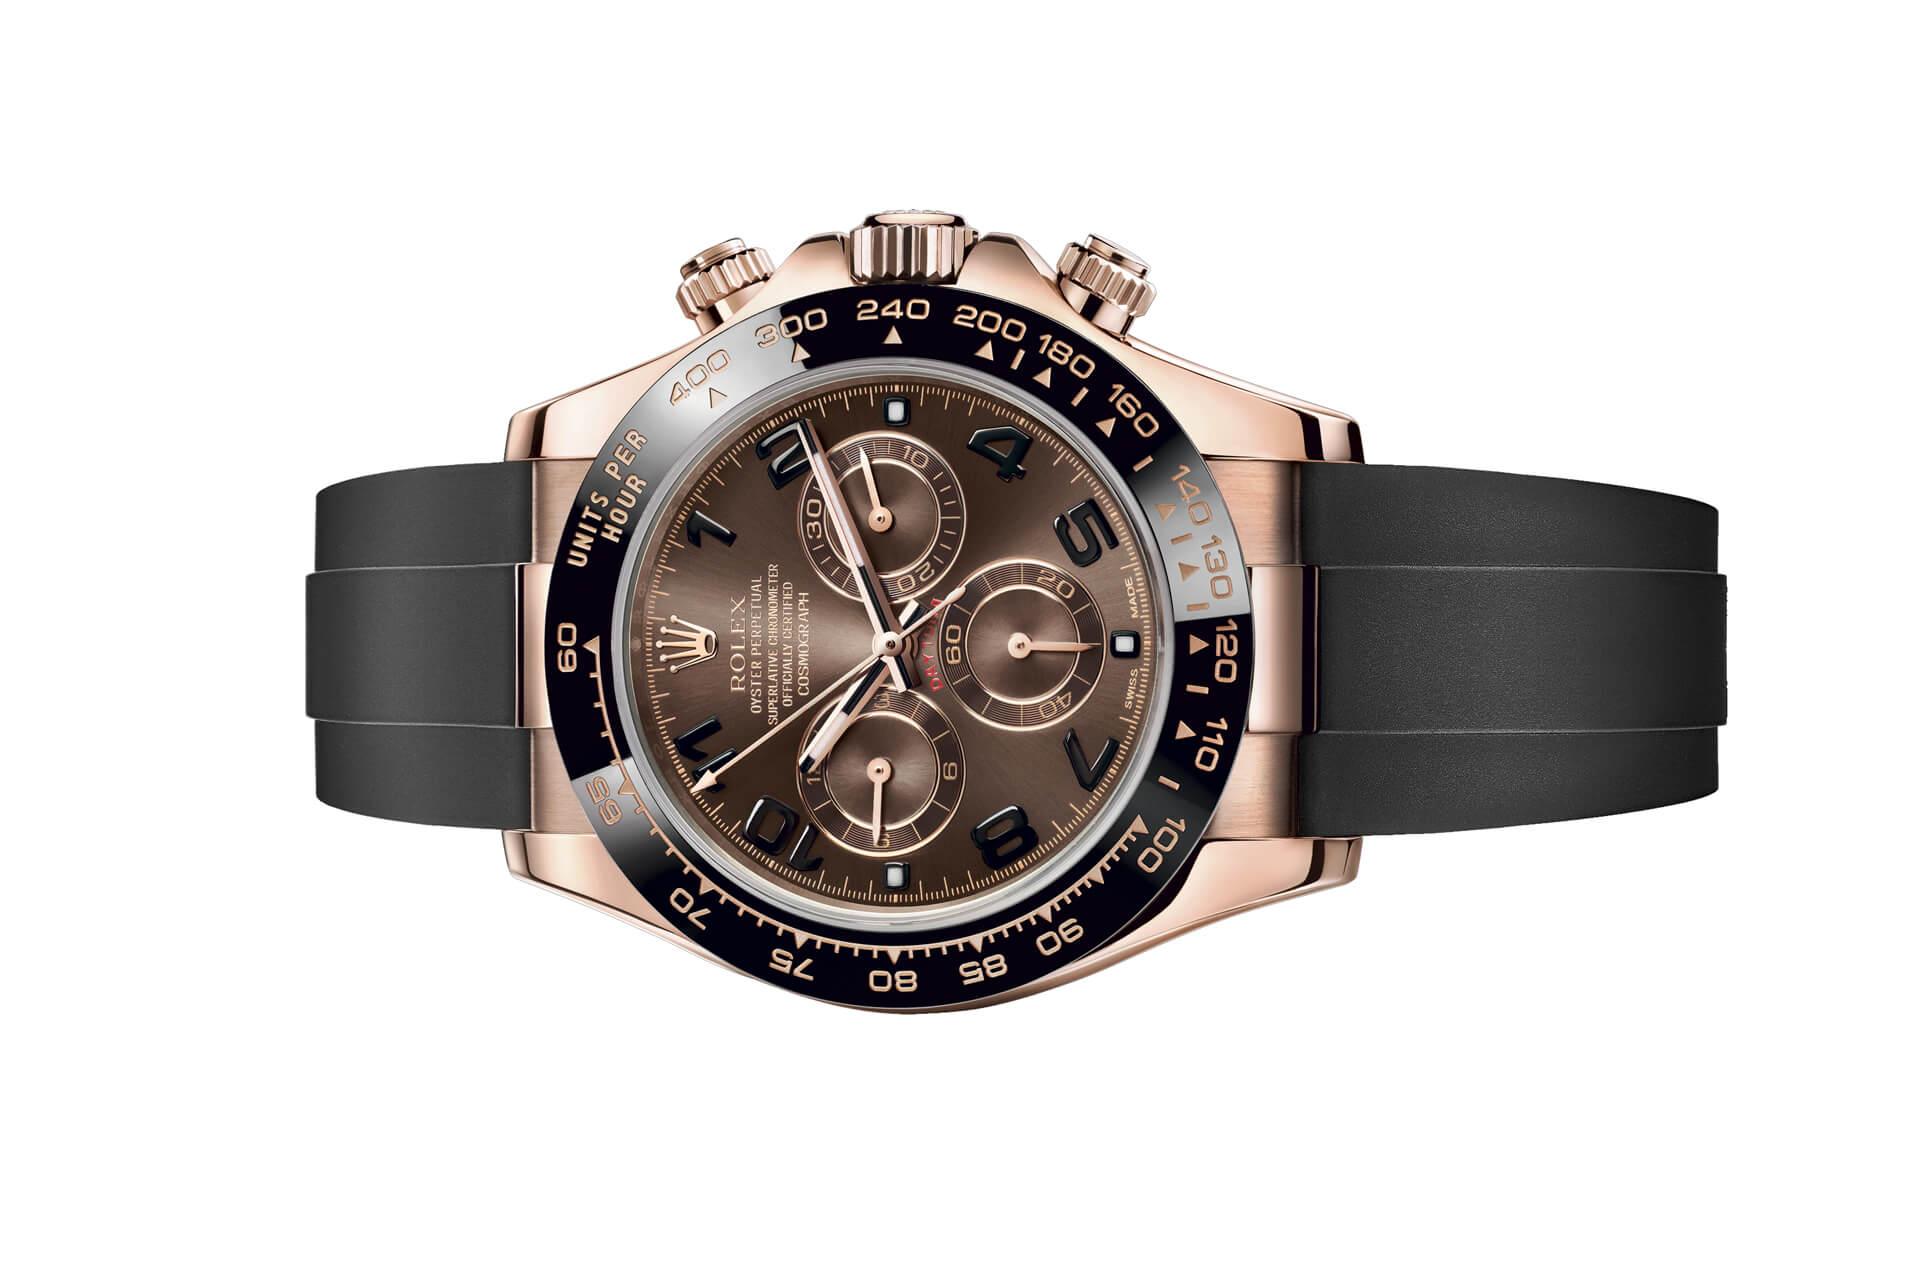 Phiên bản đồng hồ  Rolex Cosmograph Daytona 116515 mặt số Chocolate